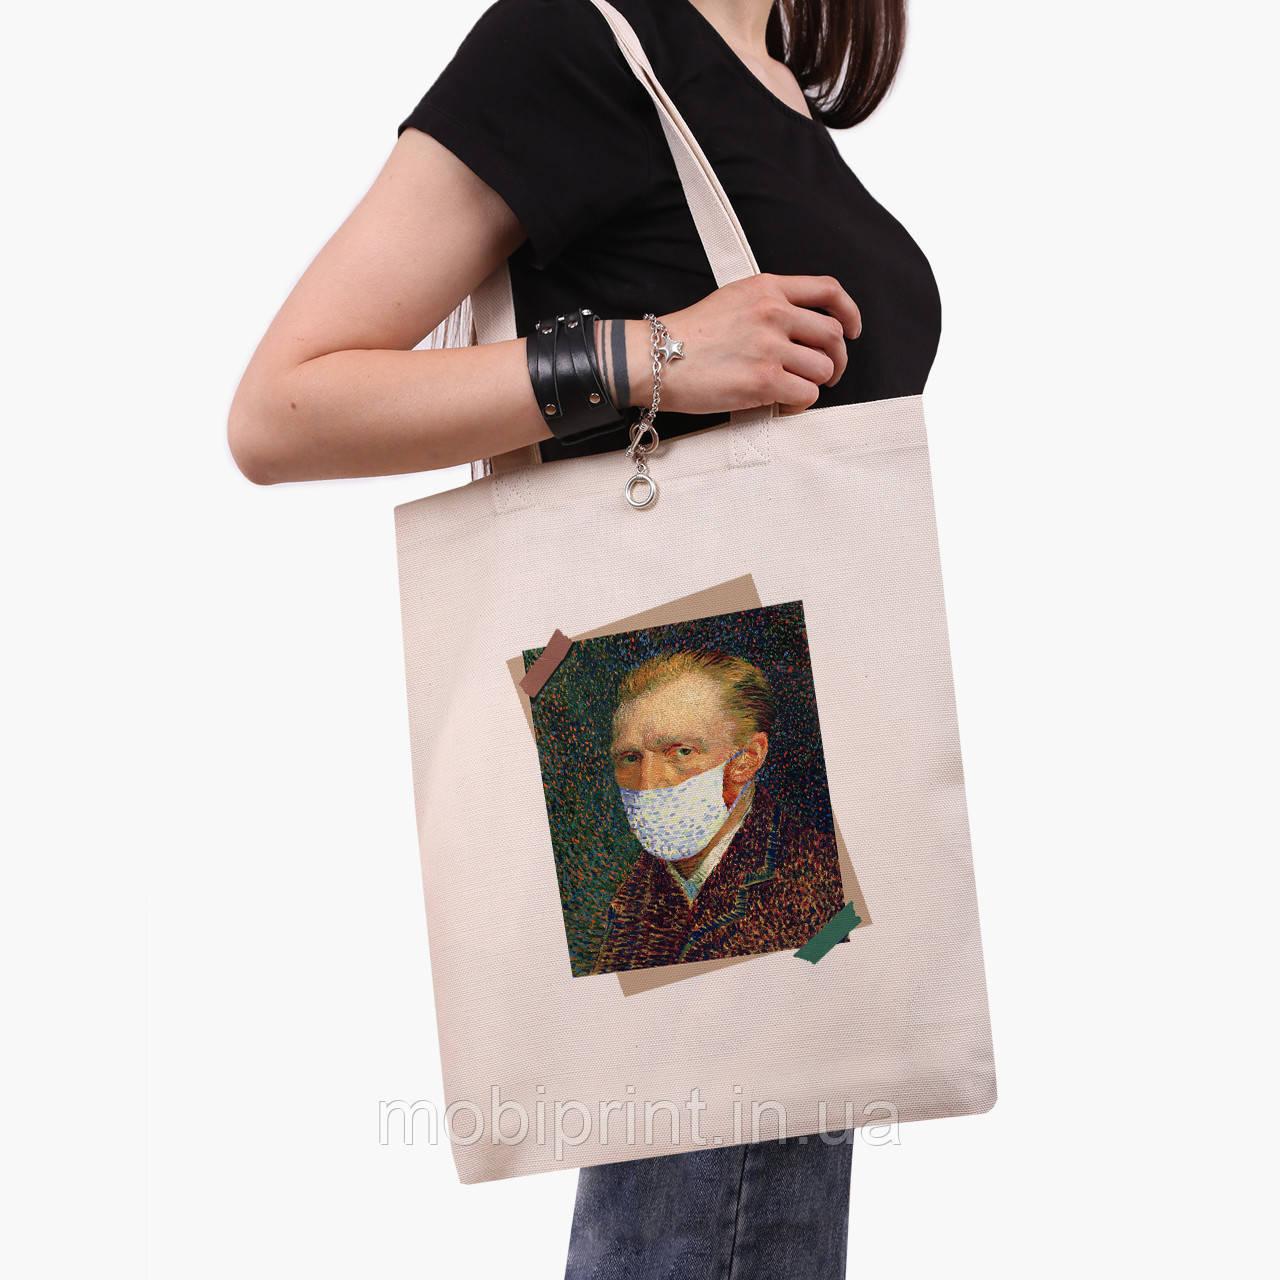 "Эко сумка шоппер Винсент Ван Гог ""Карантин"" (Vincent Van Gogh Quarantine) (9227-1415) экосумка шопер"